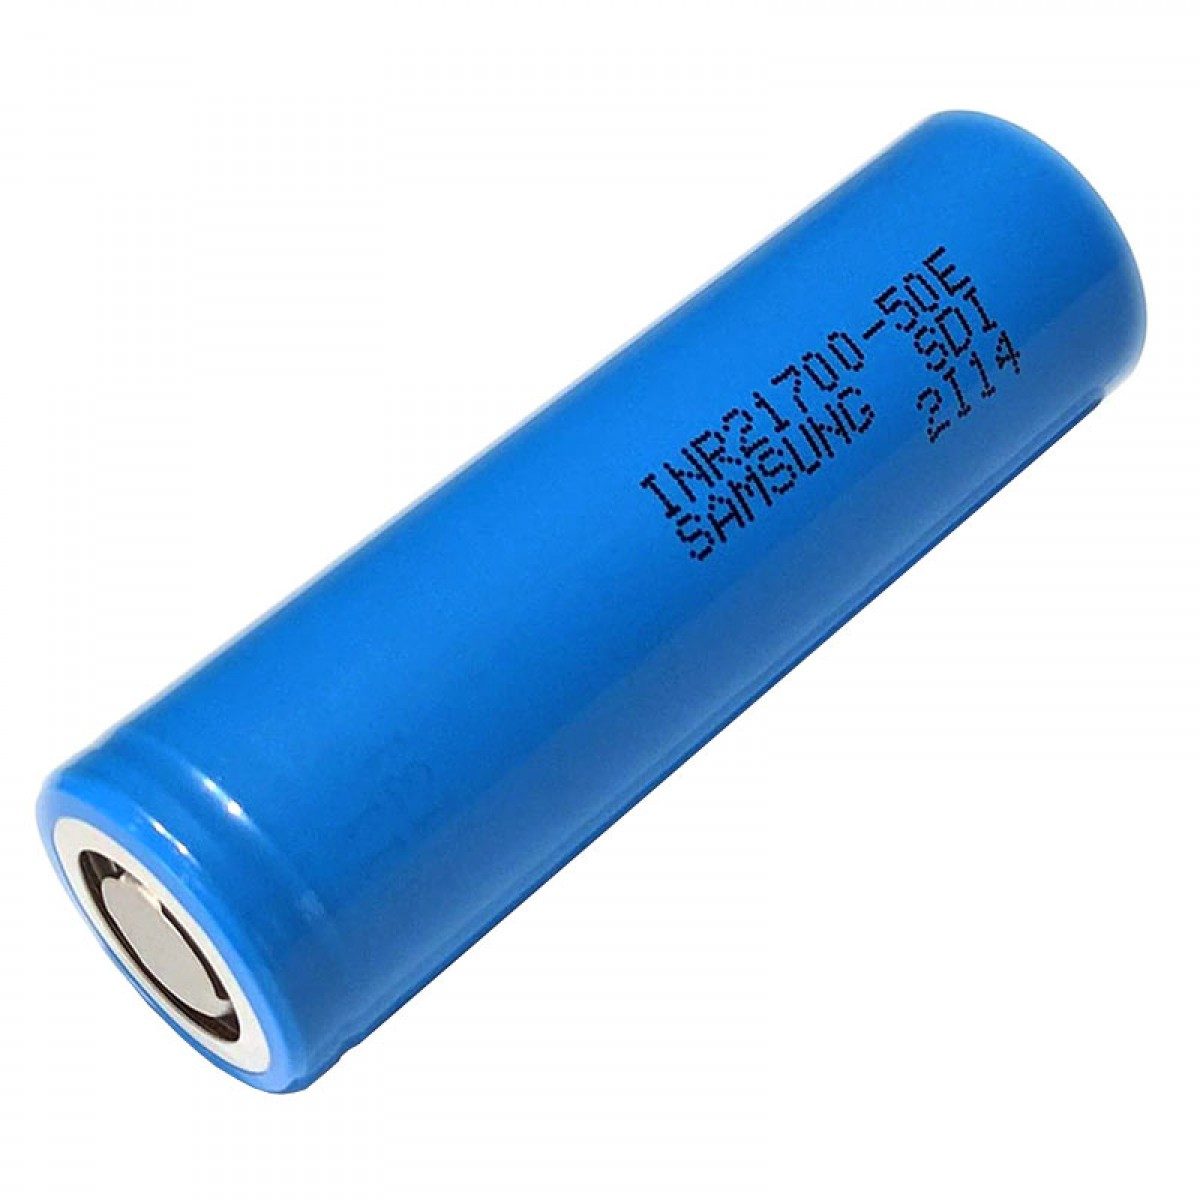 Samsung 21700 INR21700-50E 5000mAh 3.6V Rechargeable Li-ion Battery